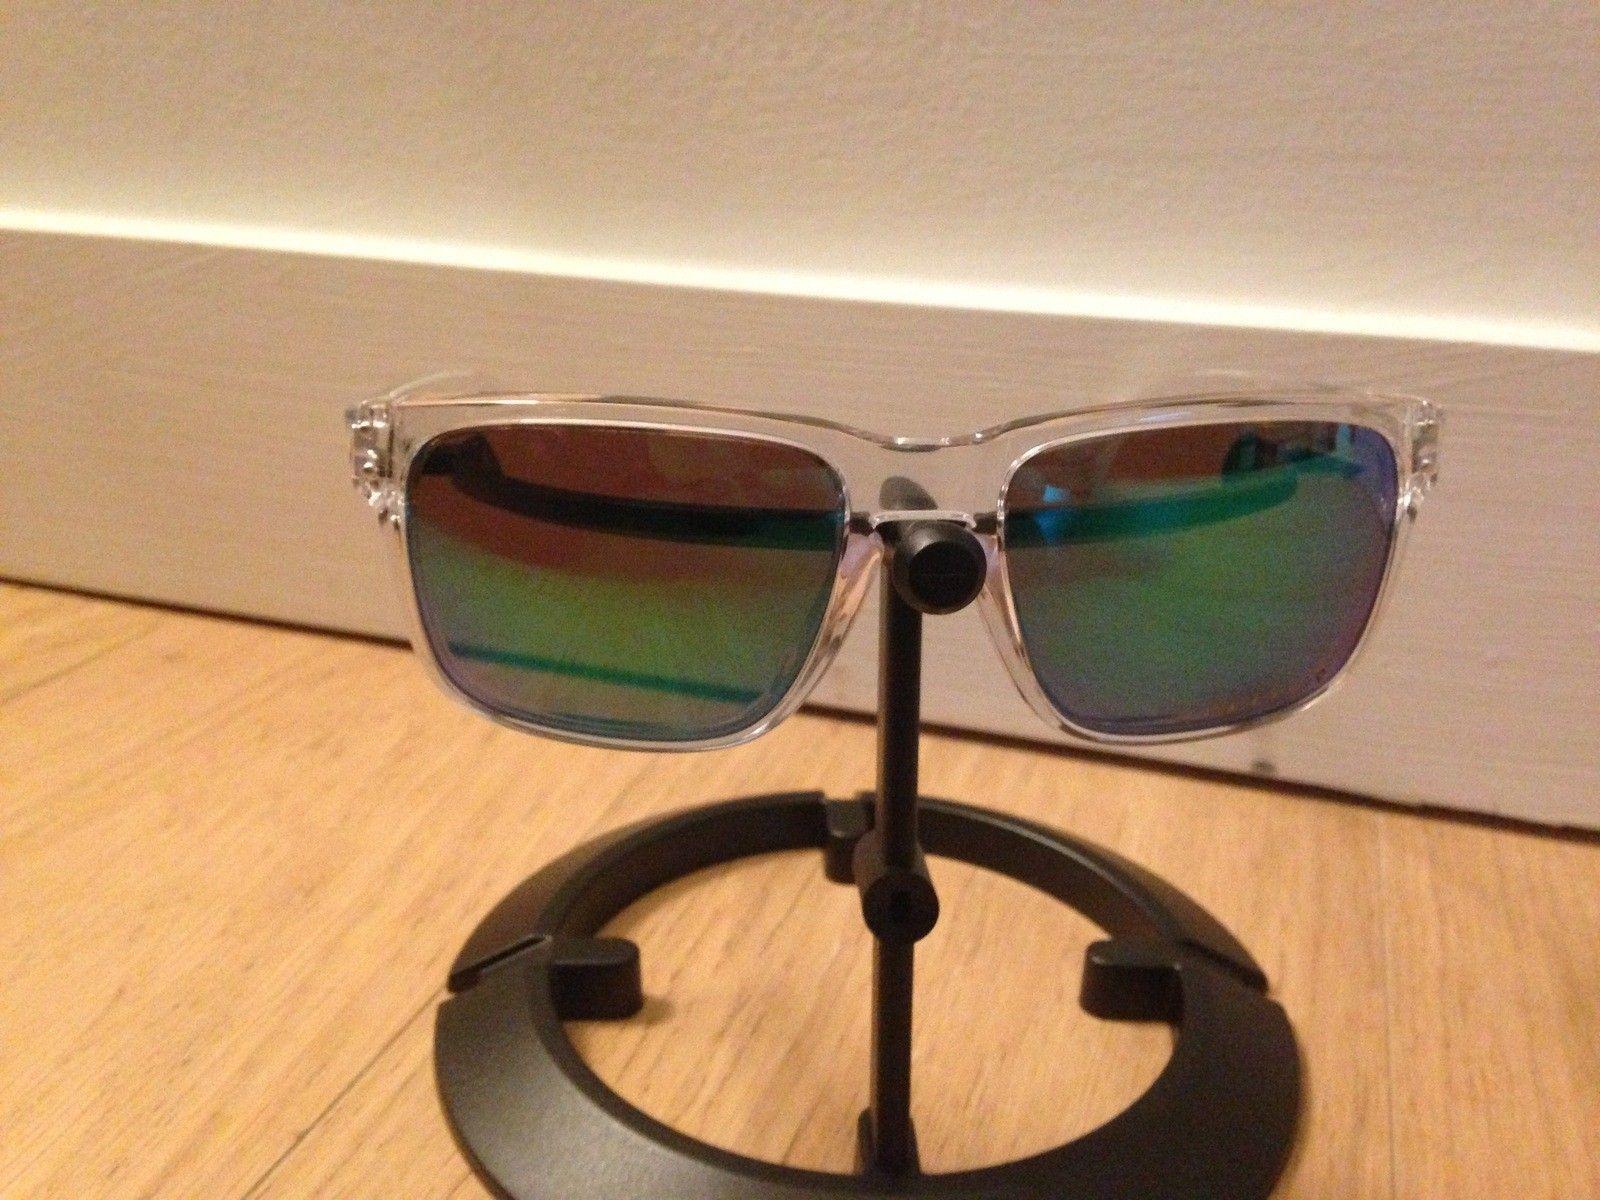 Revant Optics HC3 Elite Mirrorshield Lens Review - IMG_1734.JPG